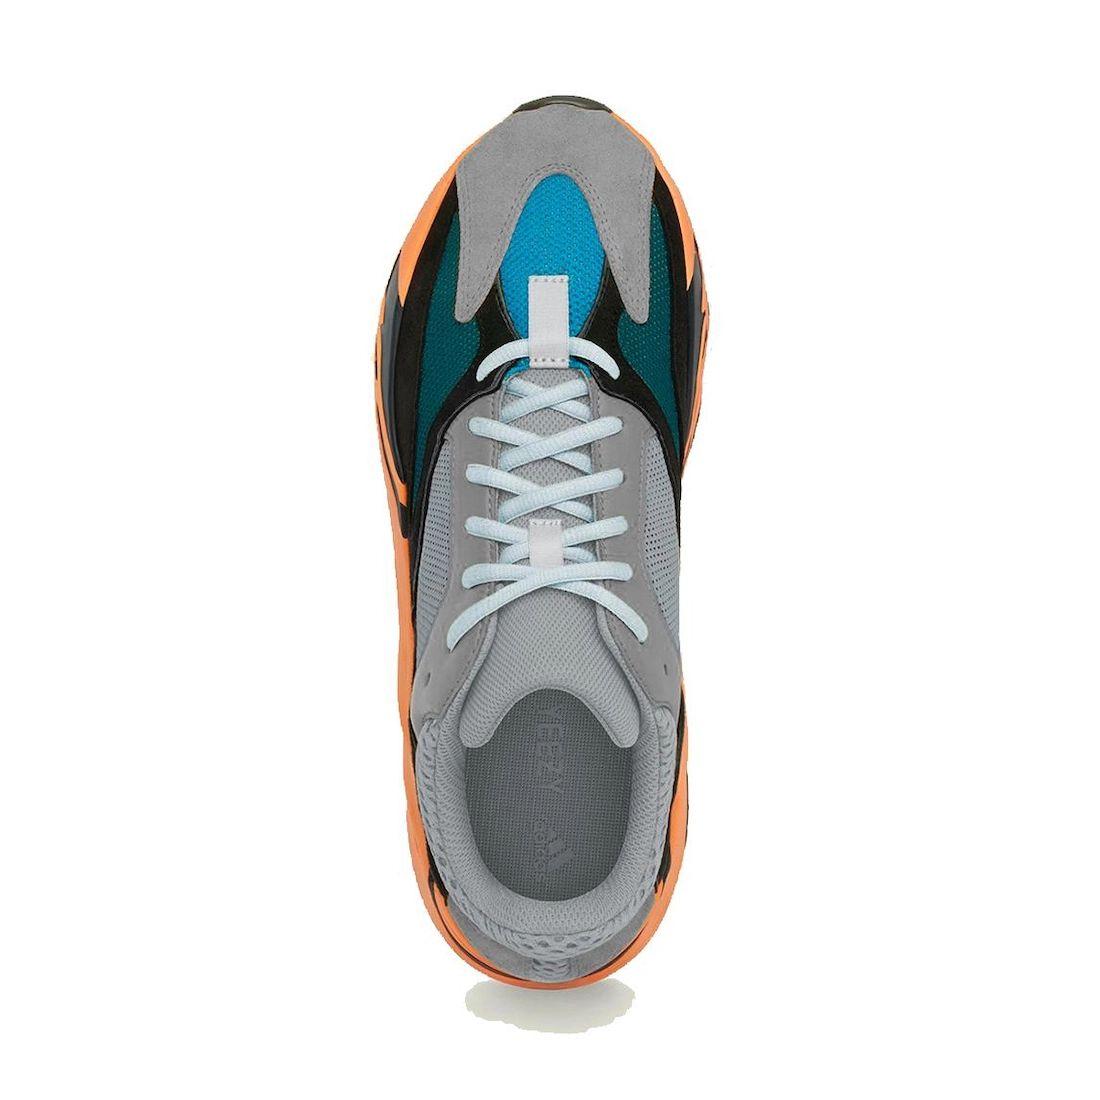 adidas Yeezy Boost 700 Wash Orange Release Date Info